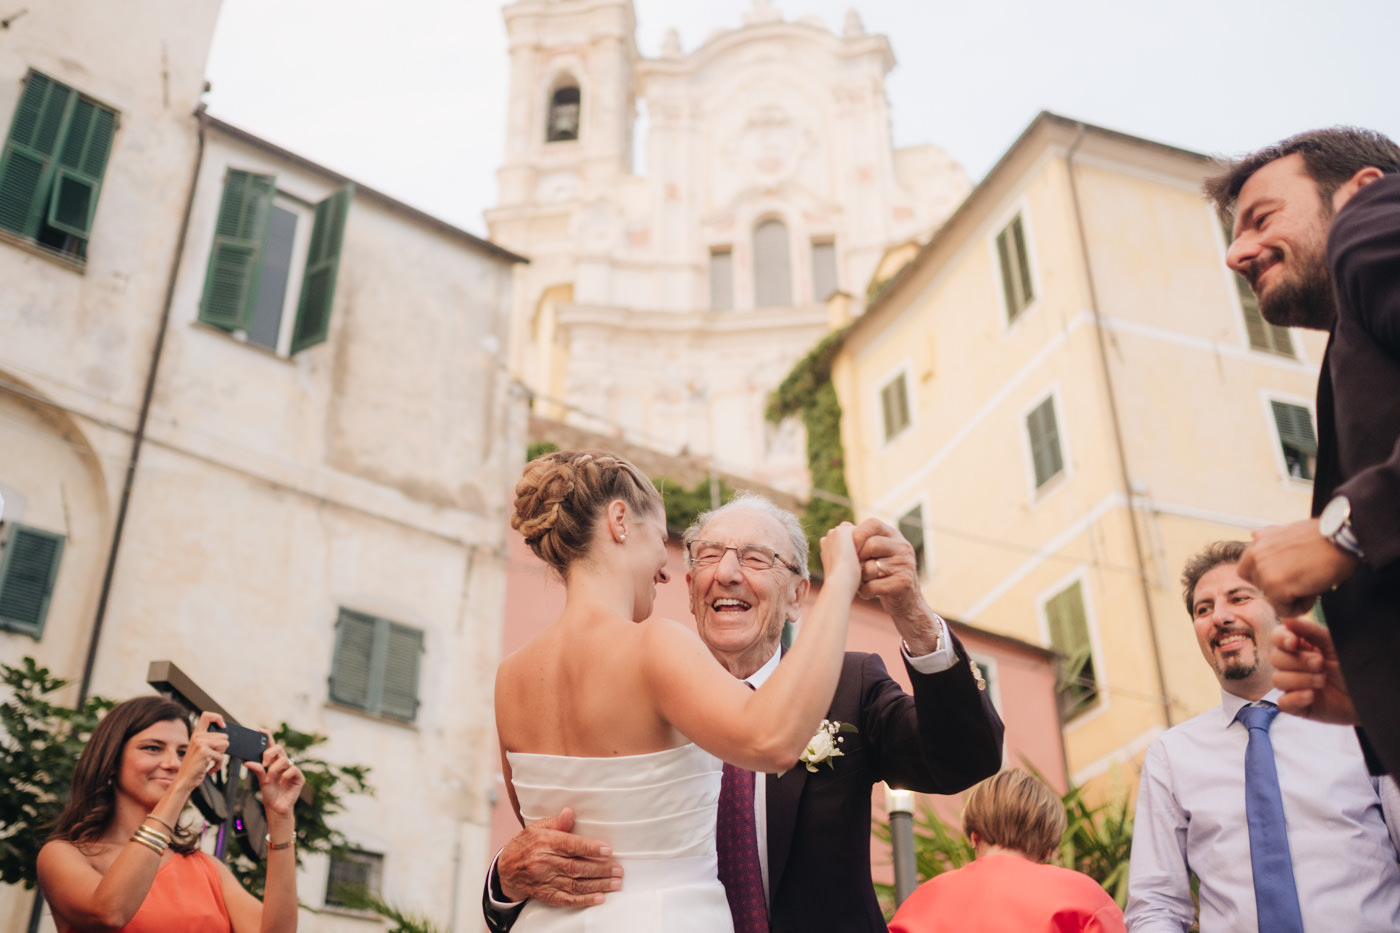 matrimoni_all_italiana_fotografo_matrimonio_cinque_terre-64.jpg